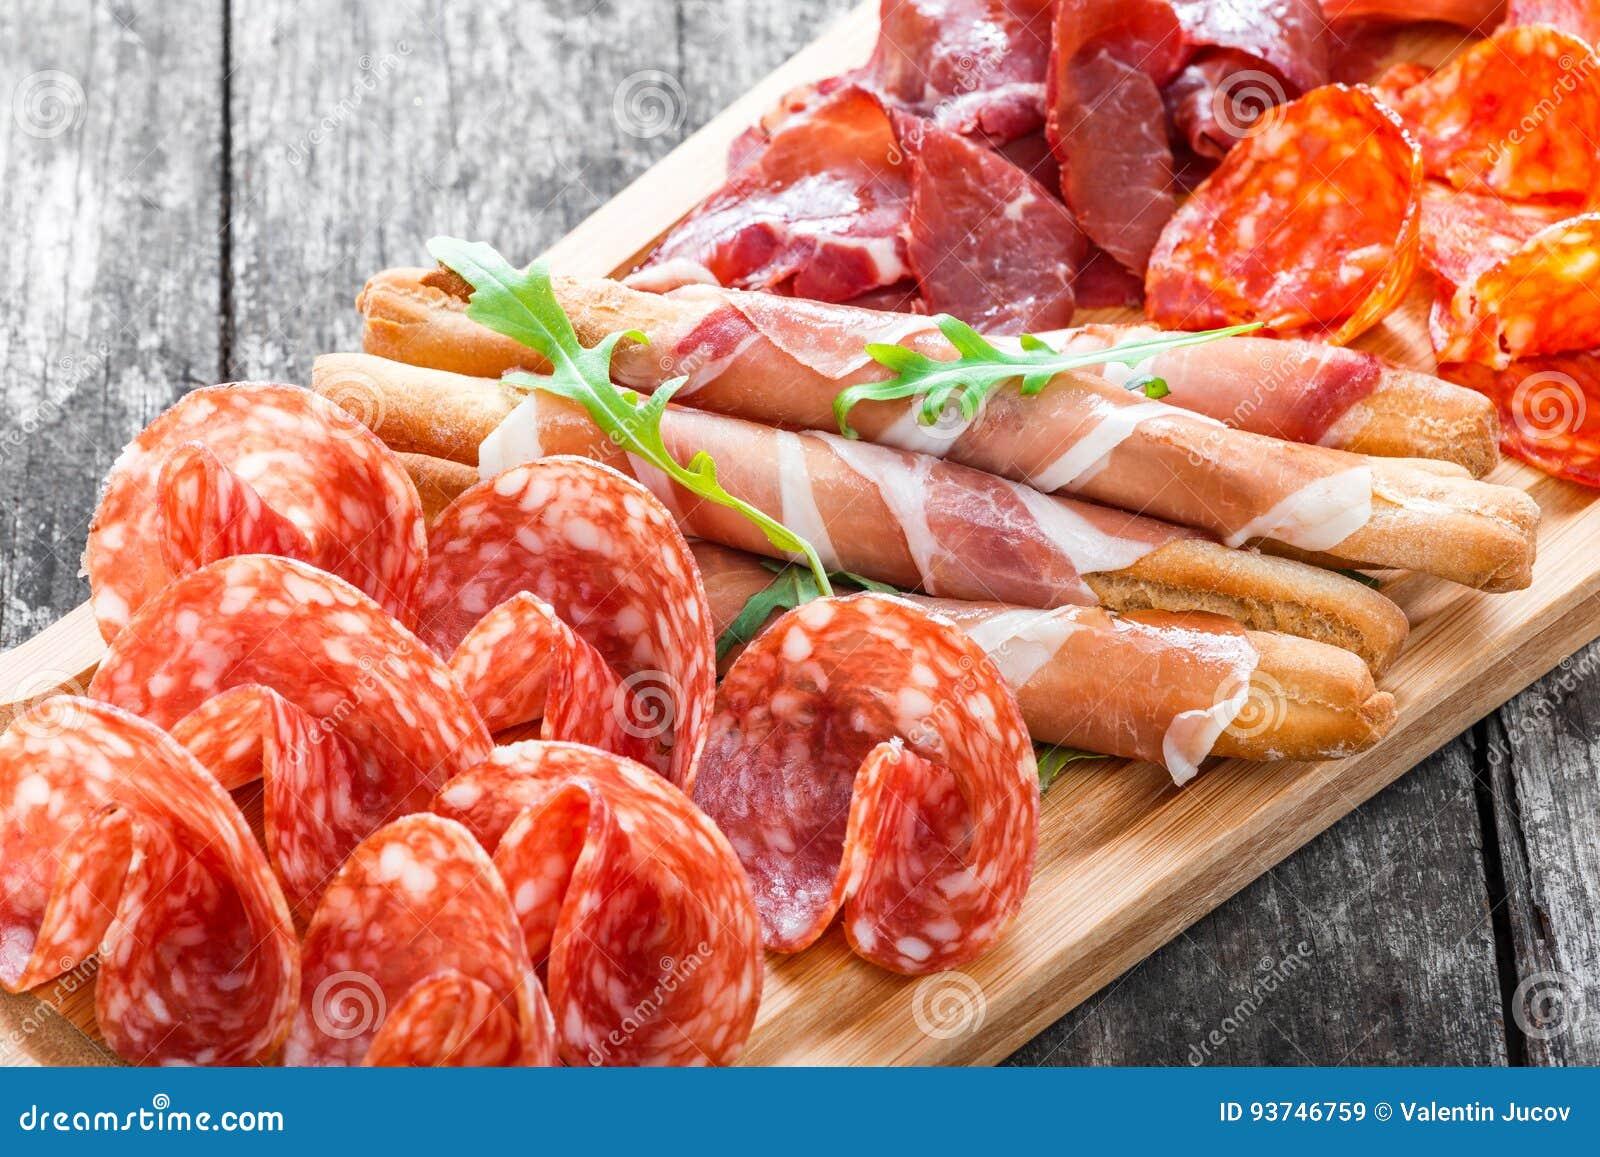 Is Eating Ham Healthy?